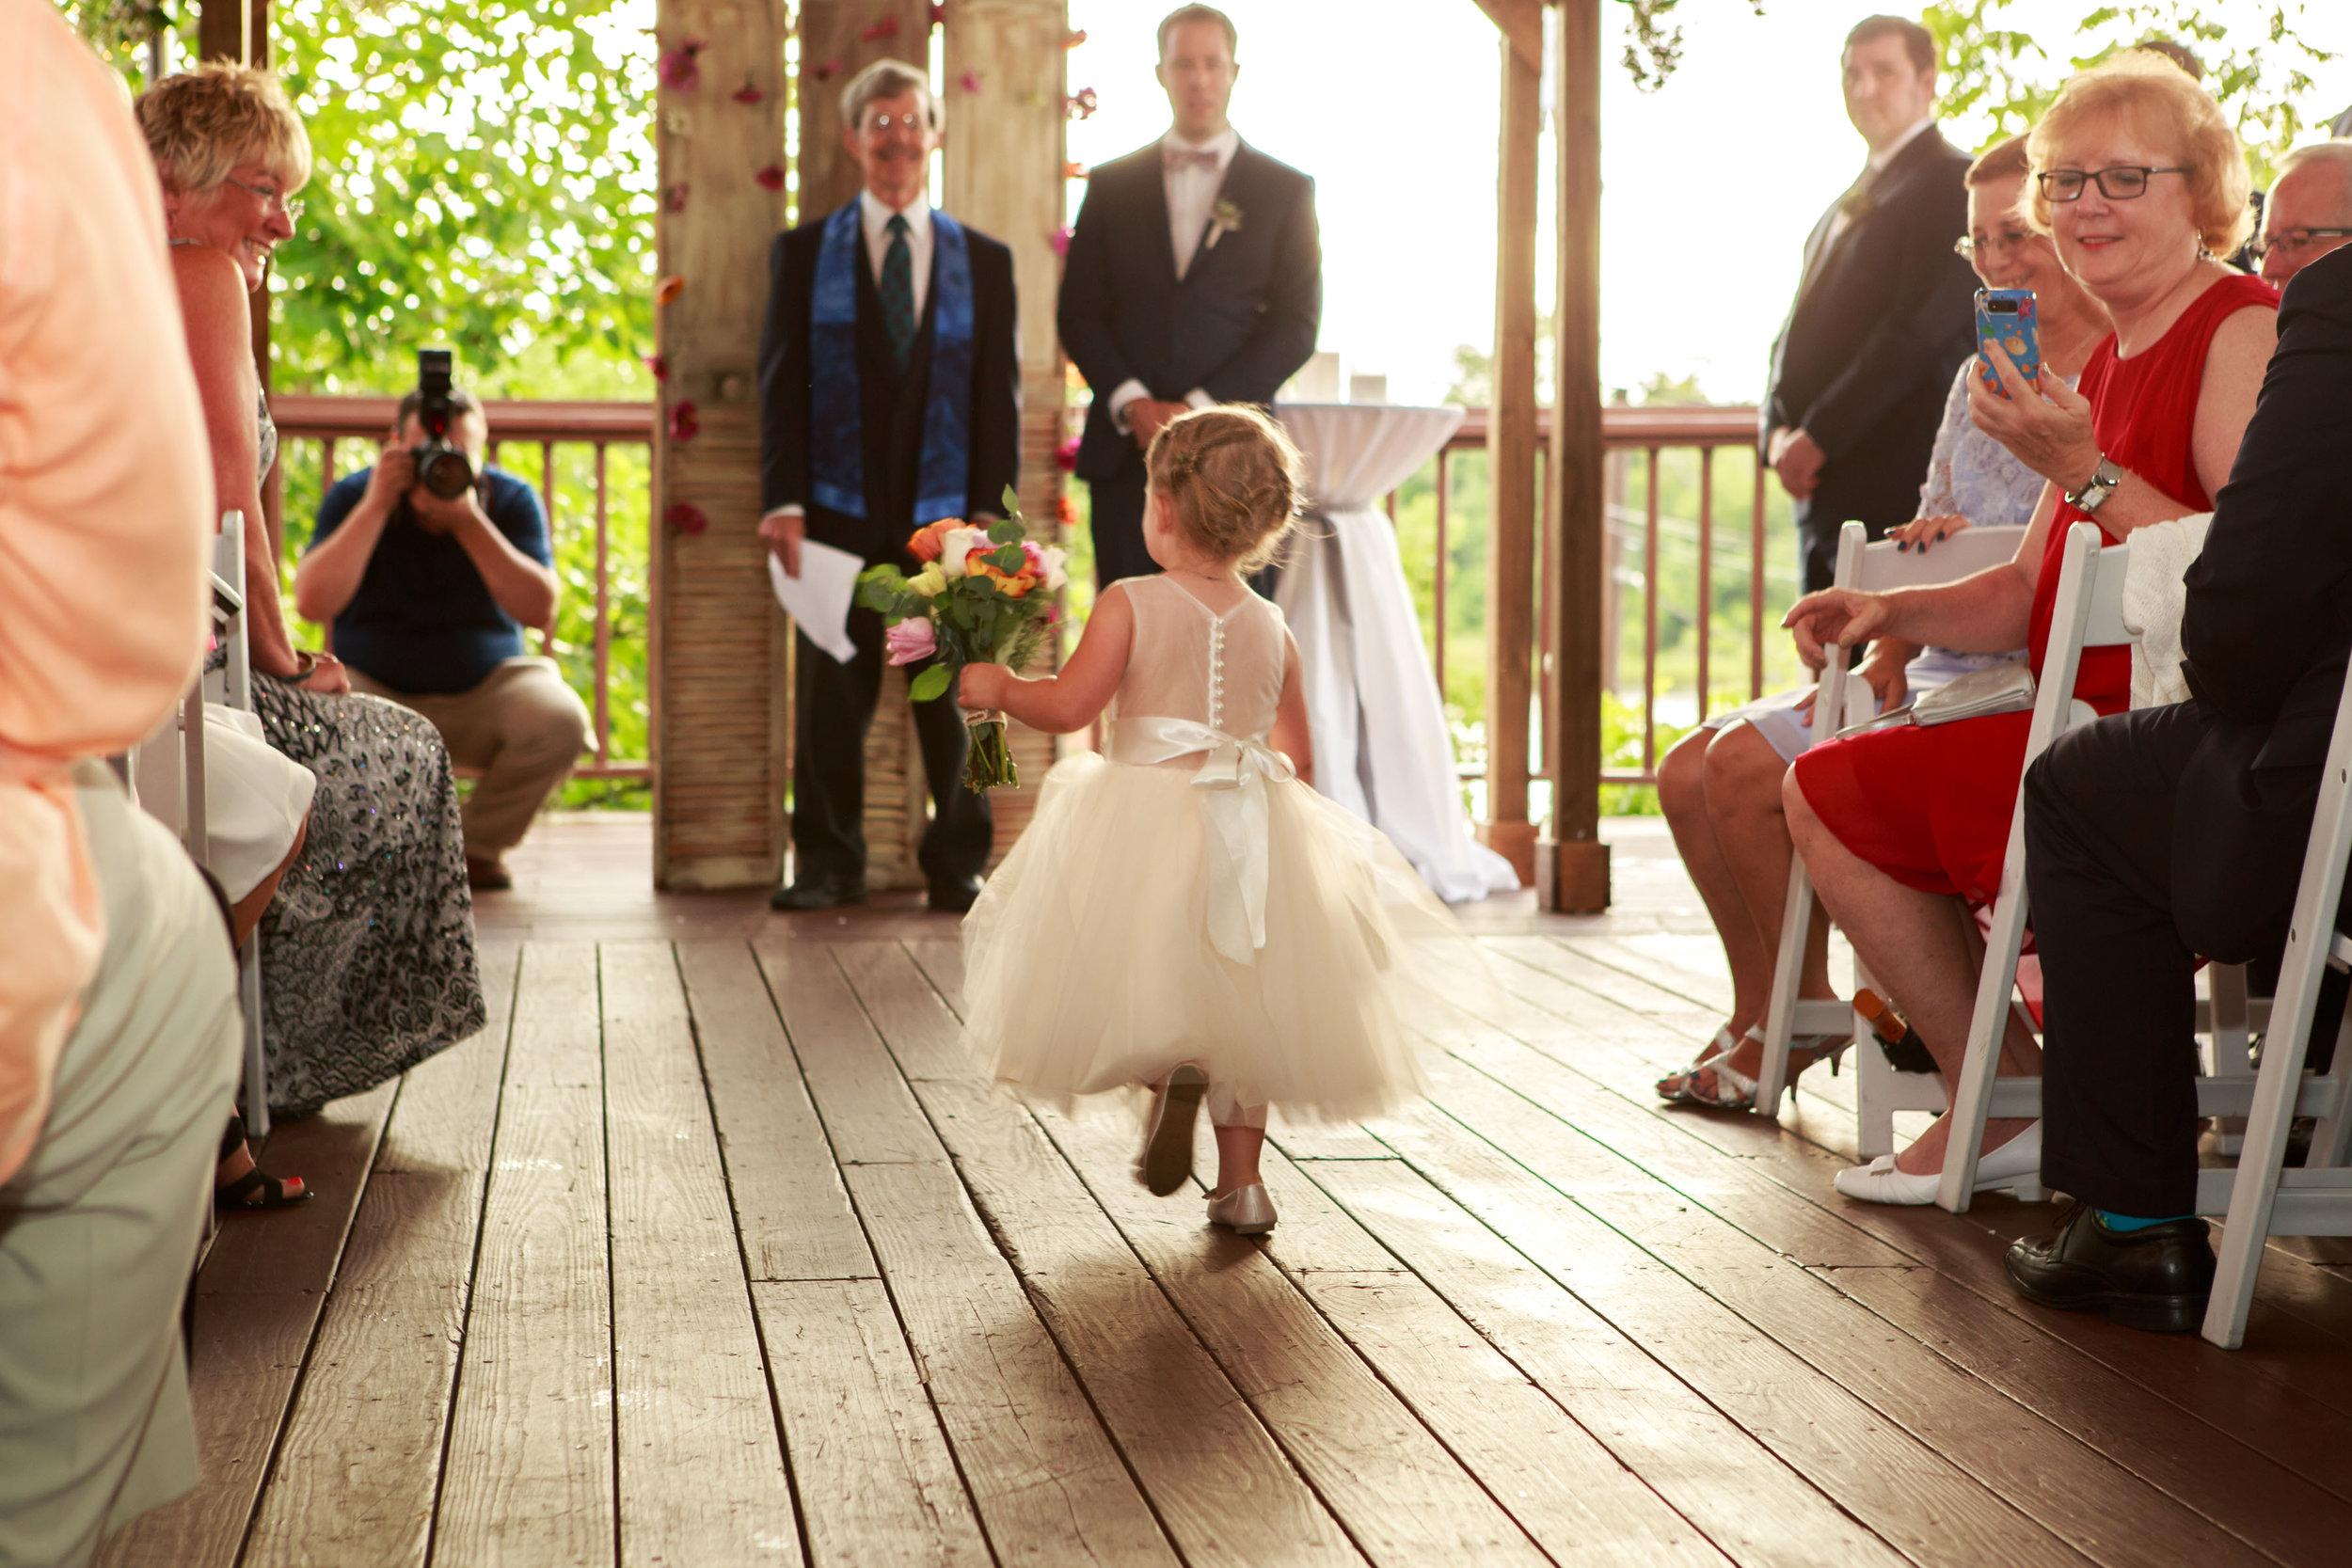 128-South-Wedding-Wilmington-NC-Photographer-Ceremony-010.jpg